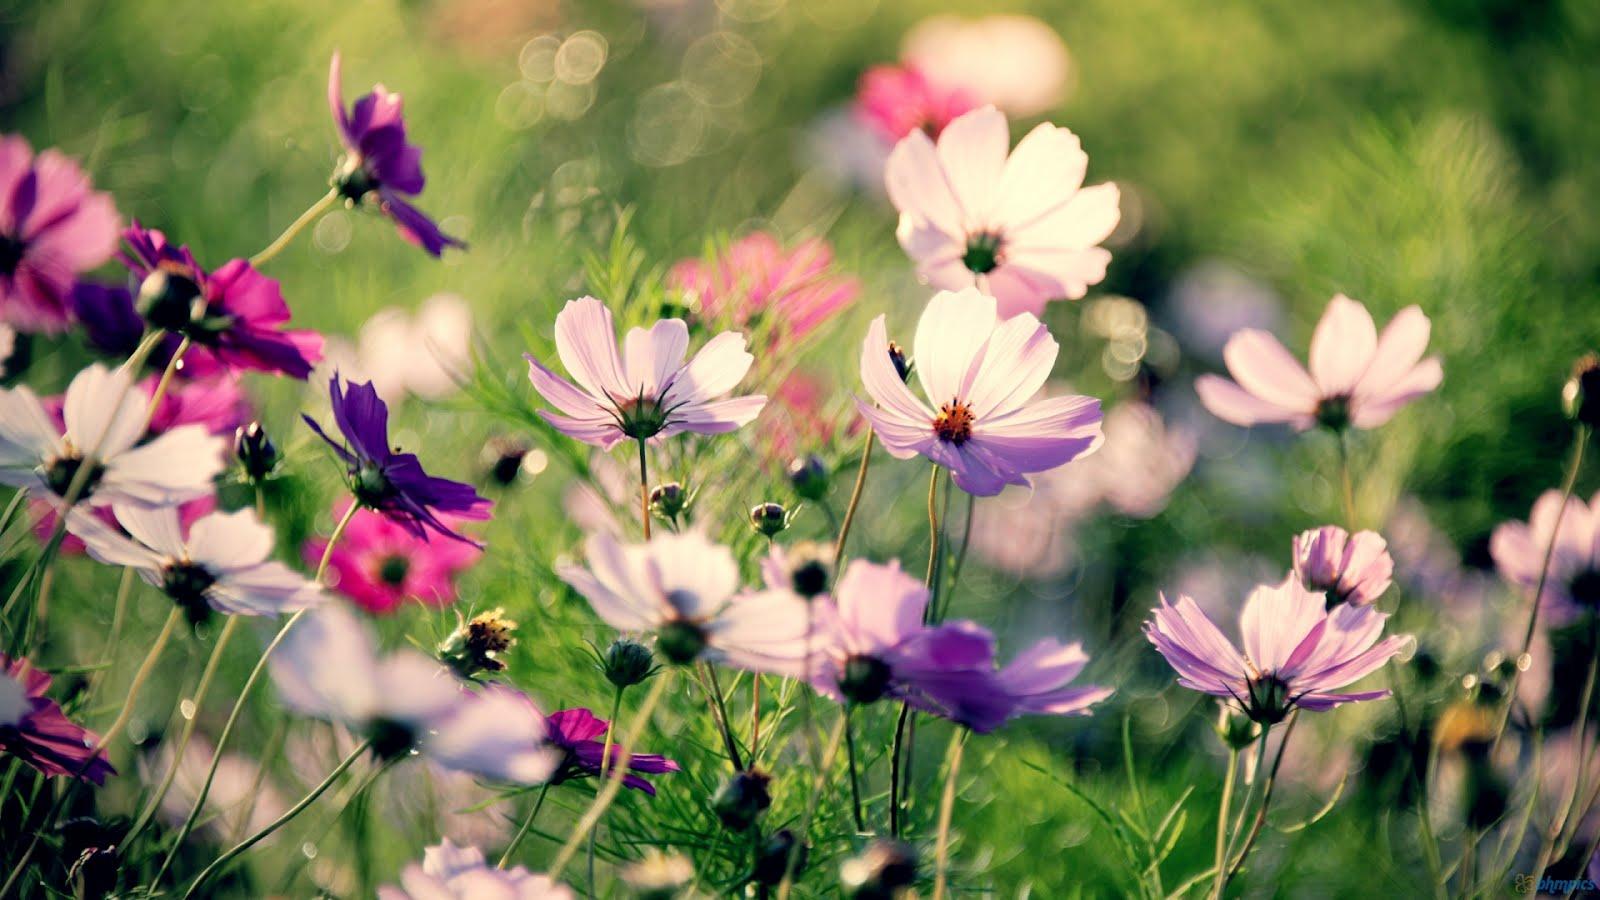 flowers desktop wallpaper 1280x800 - photo #22